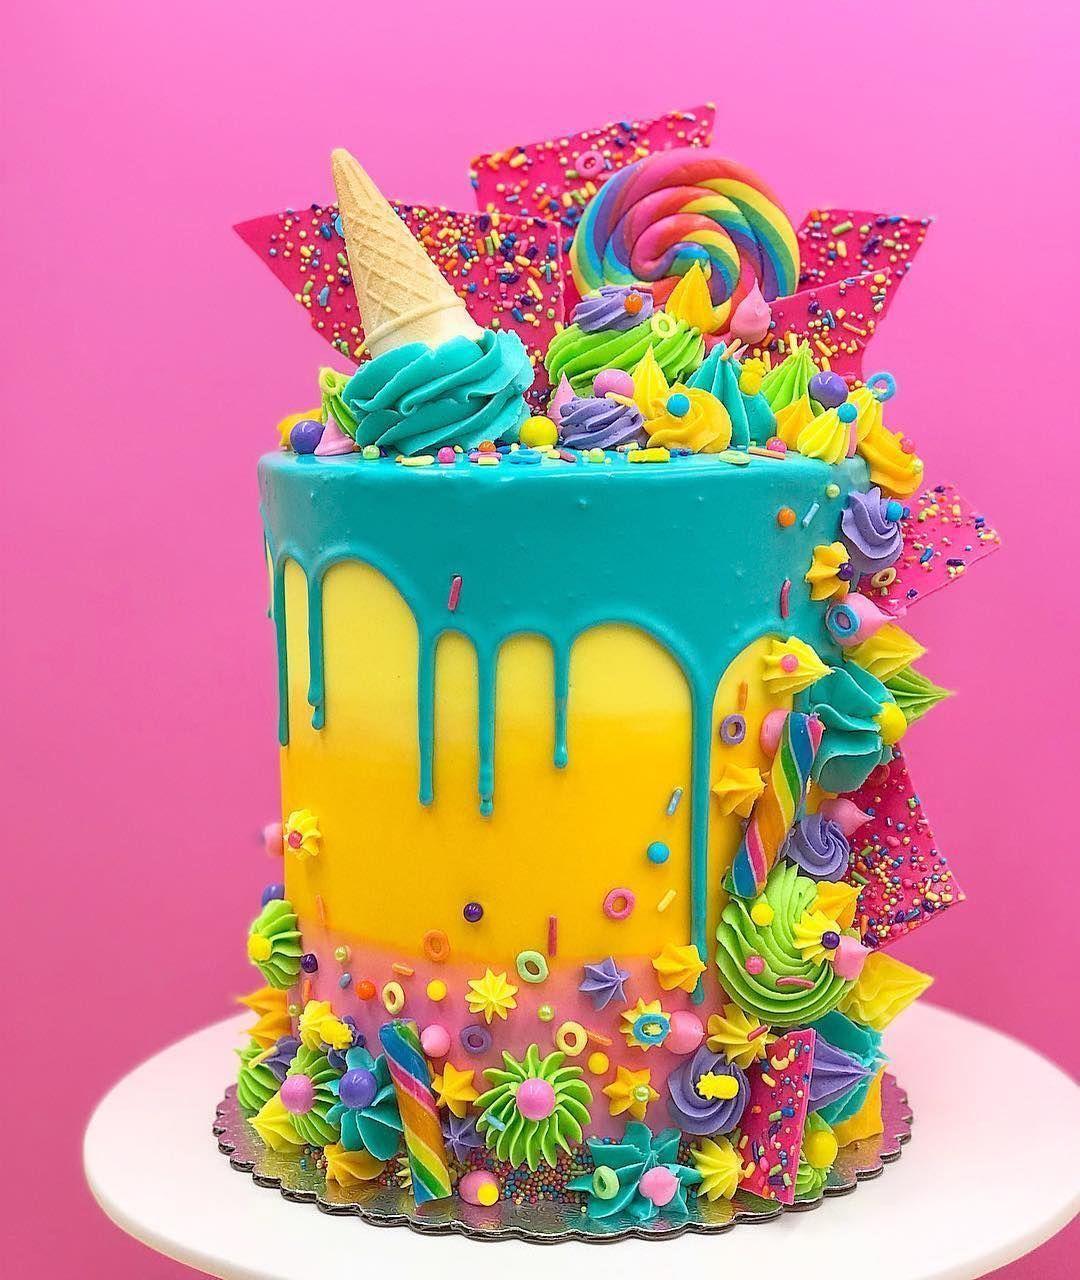 Cake Decorating Classes Houston | Candy birthday cakes, Crazy cakes, Cake decorating classes